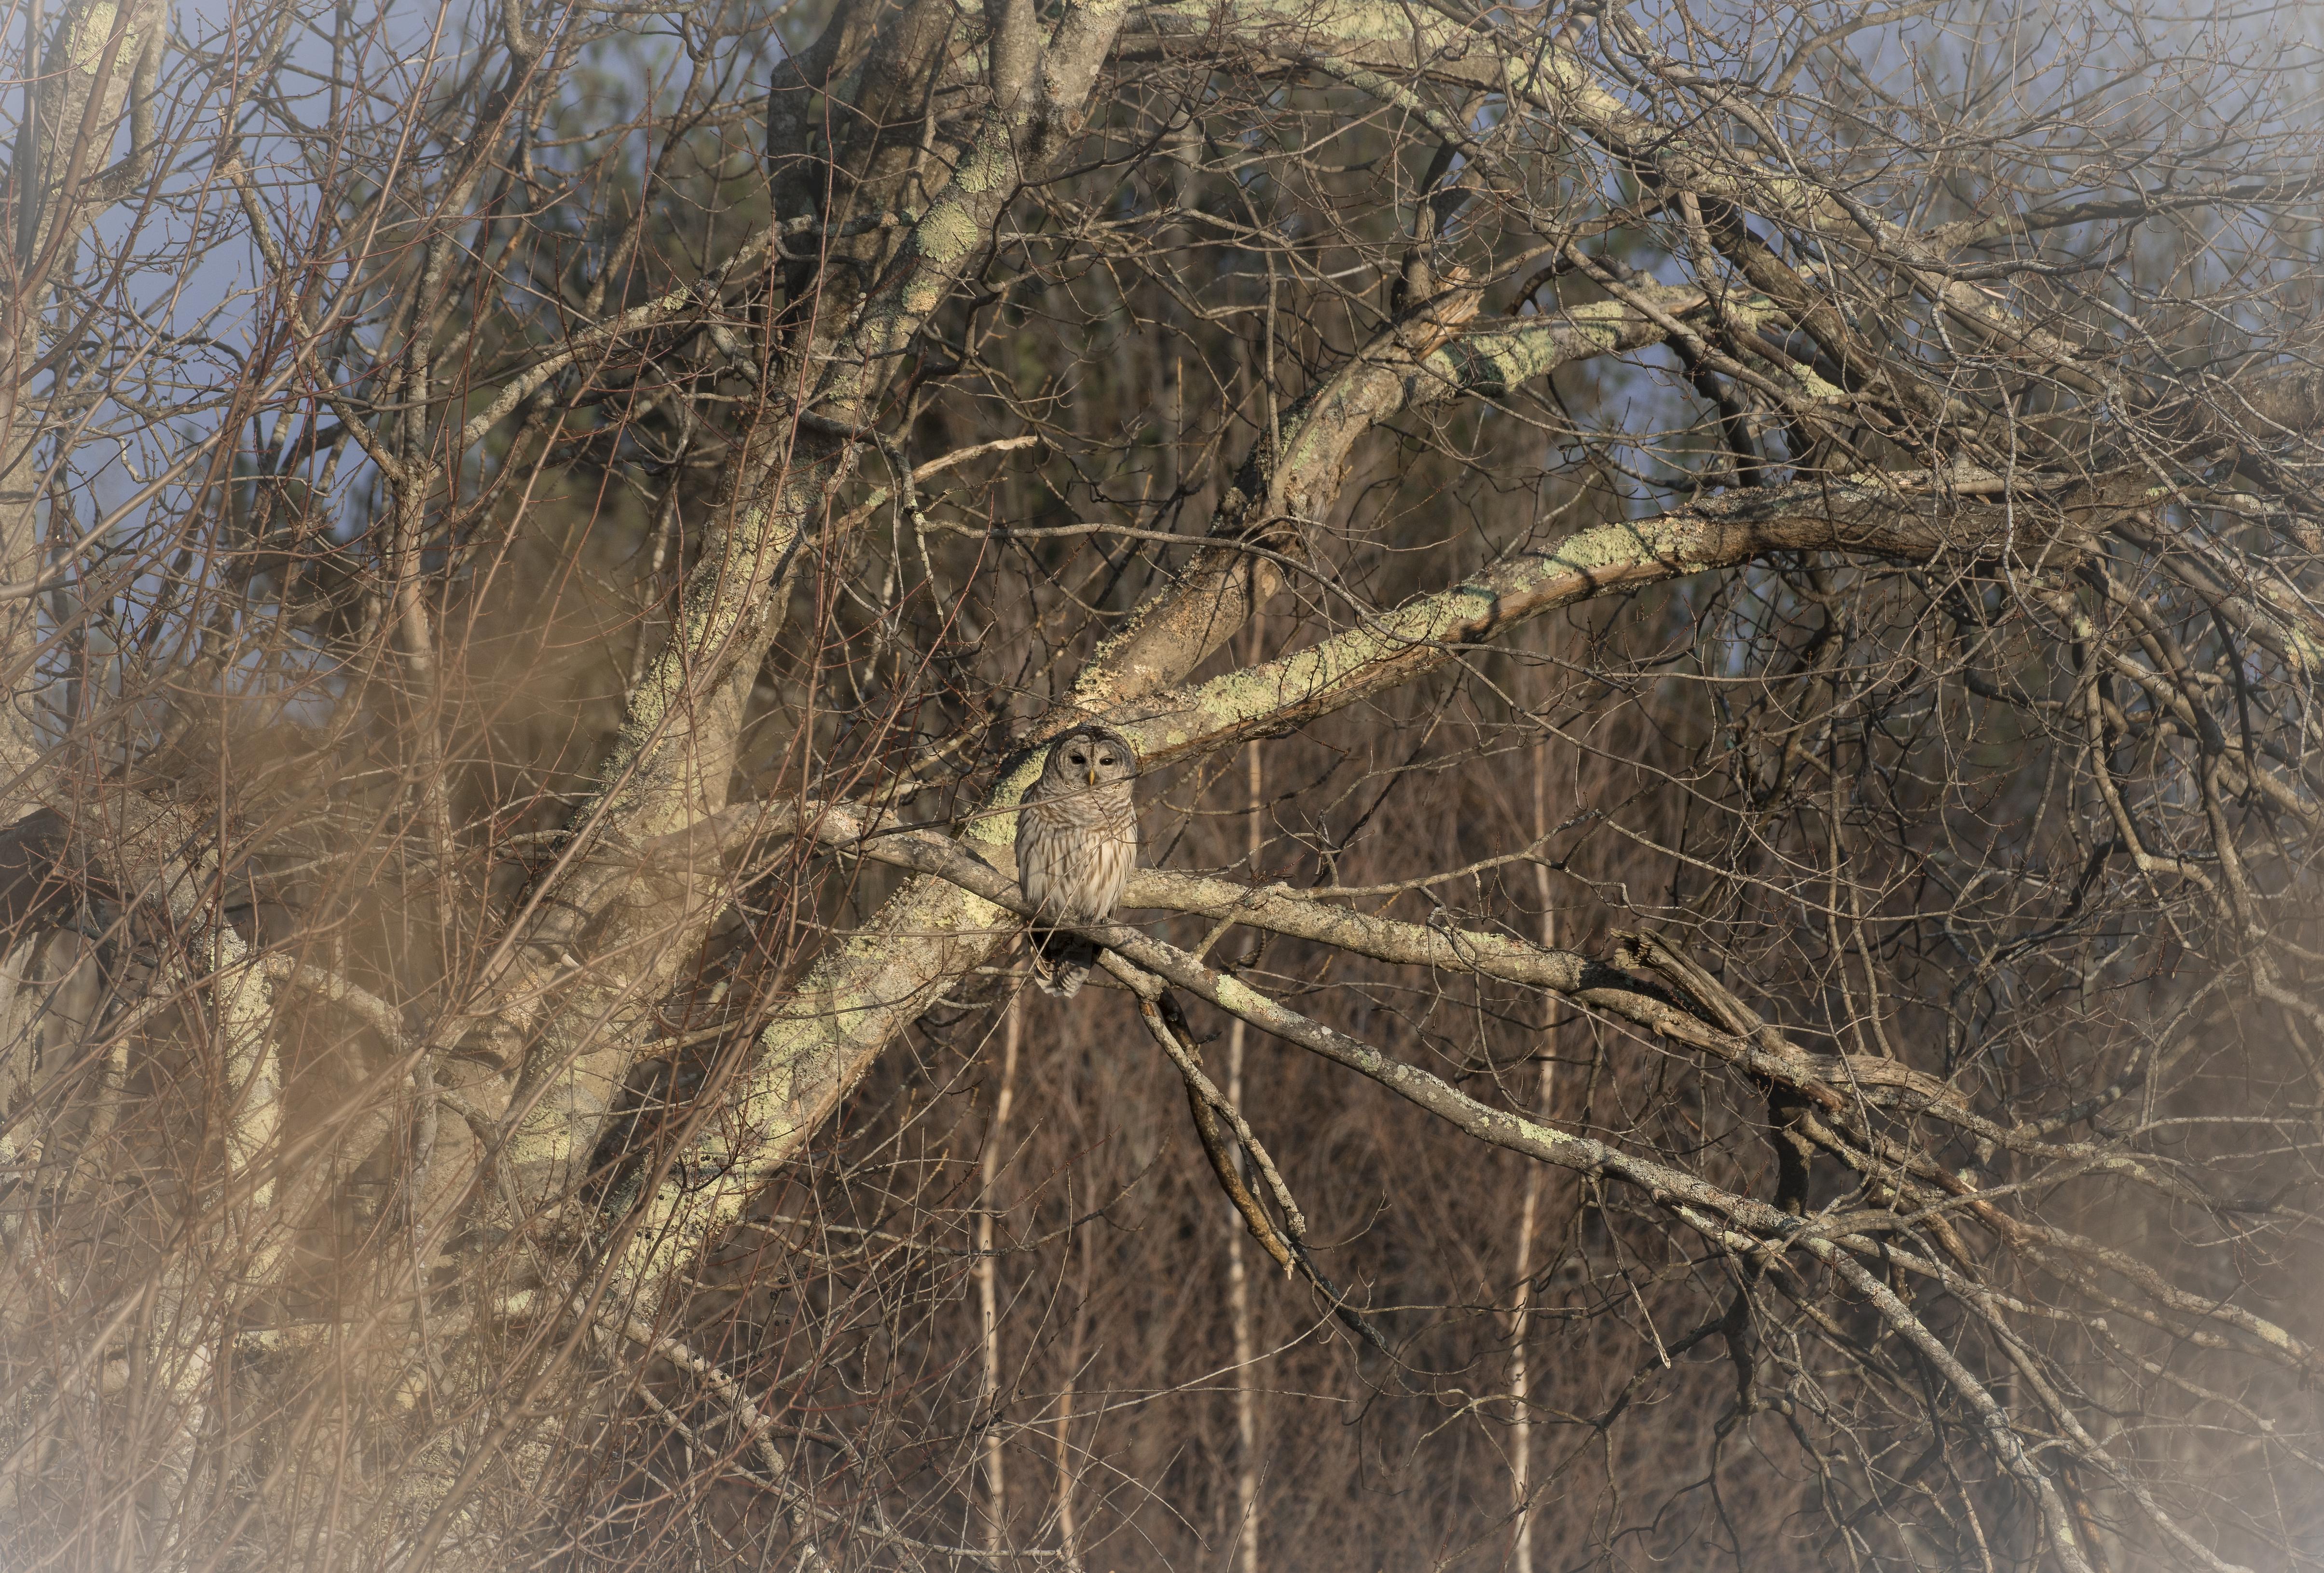 barred owl 4s4a9378wm